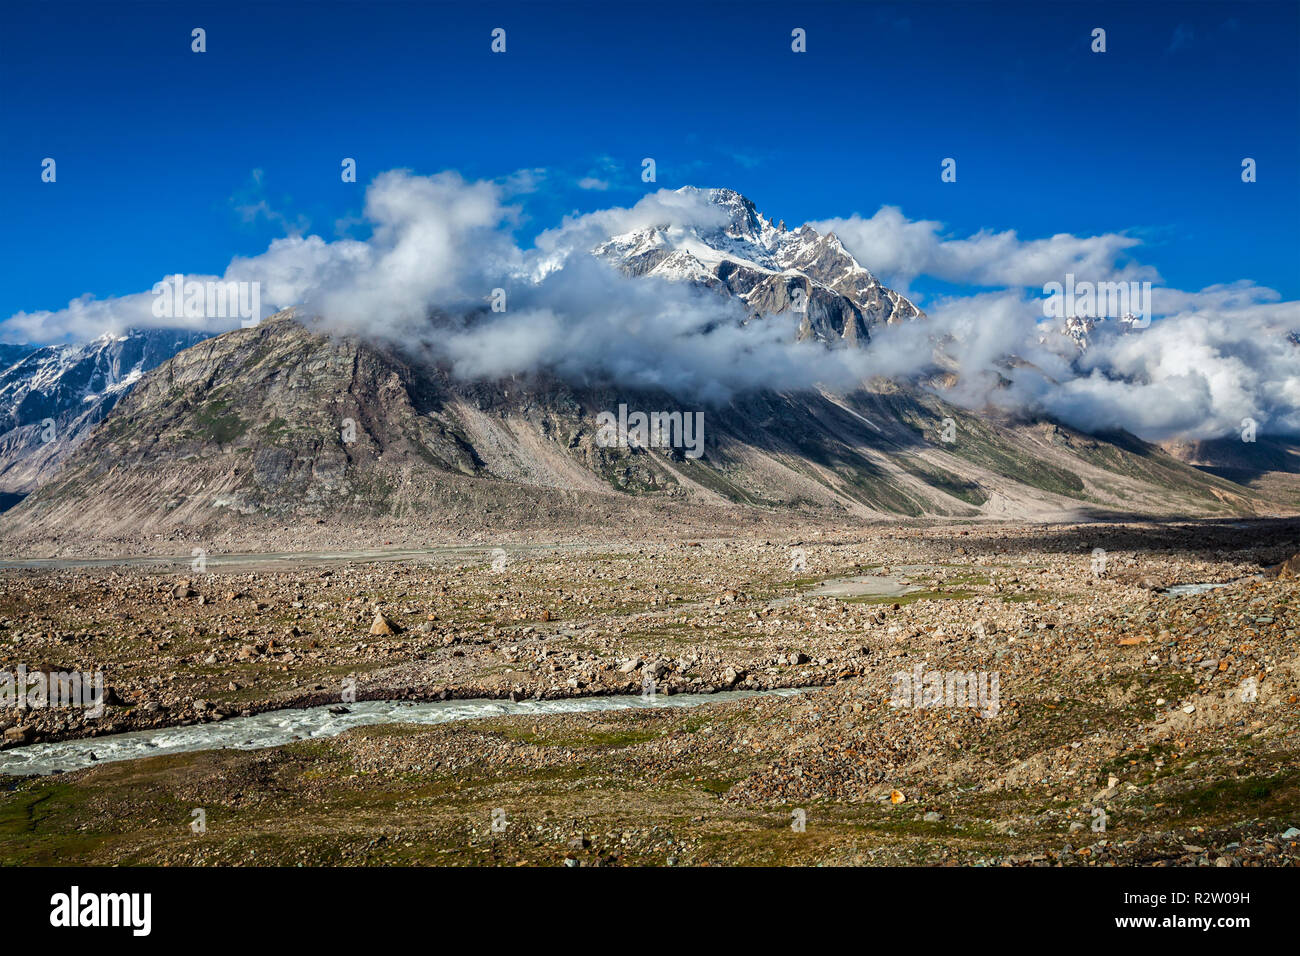 Himalayan landscape, India - Stock Image